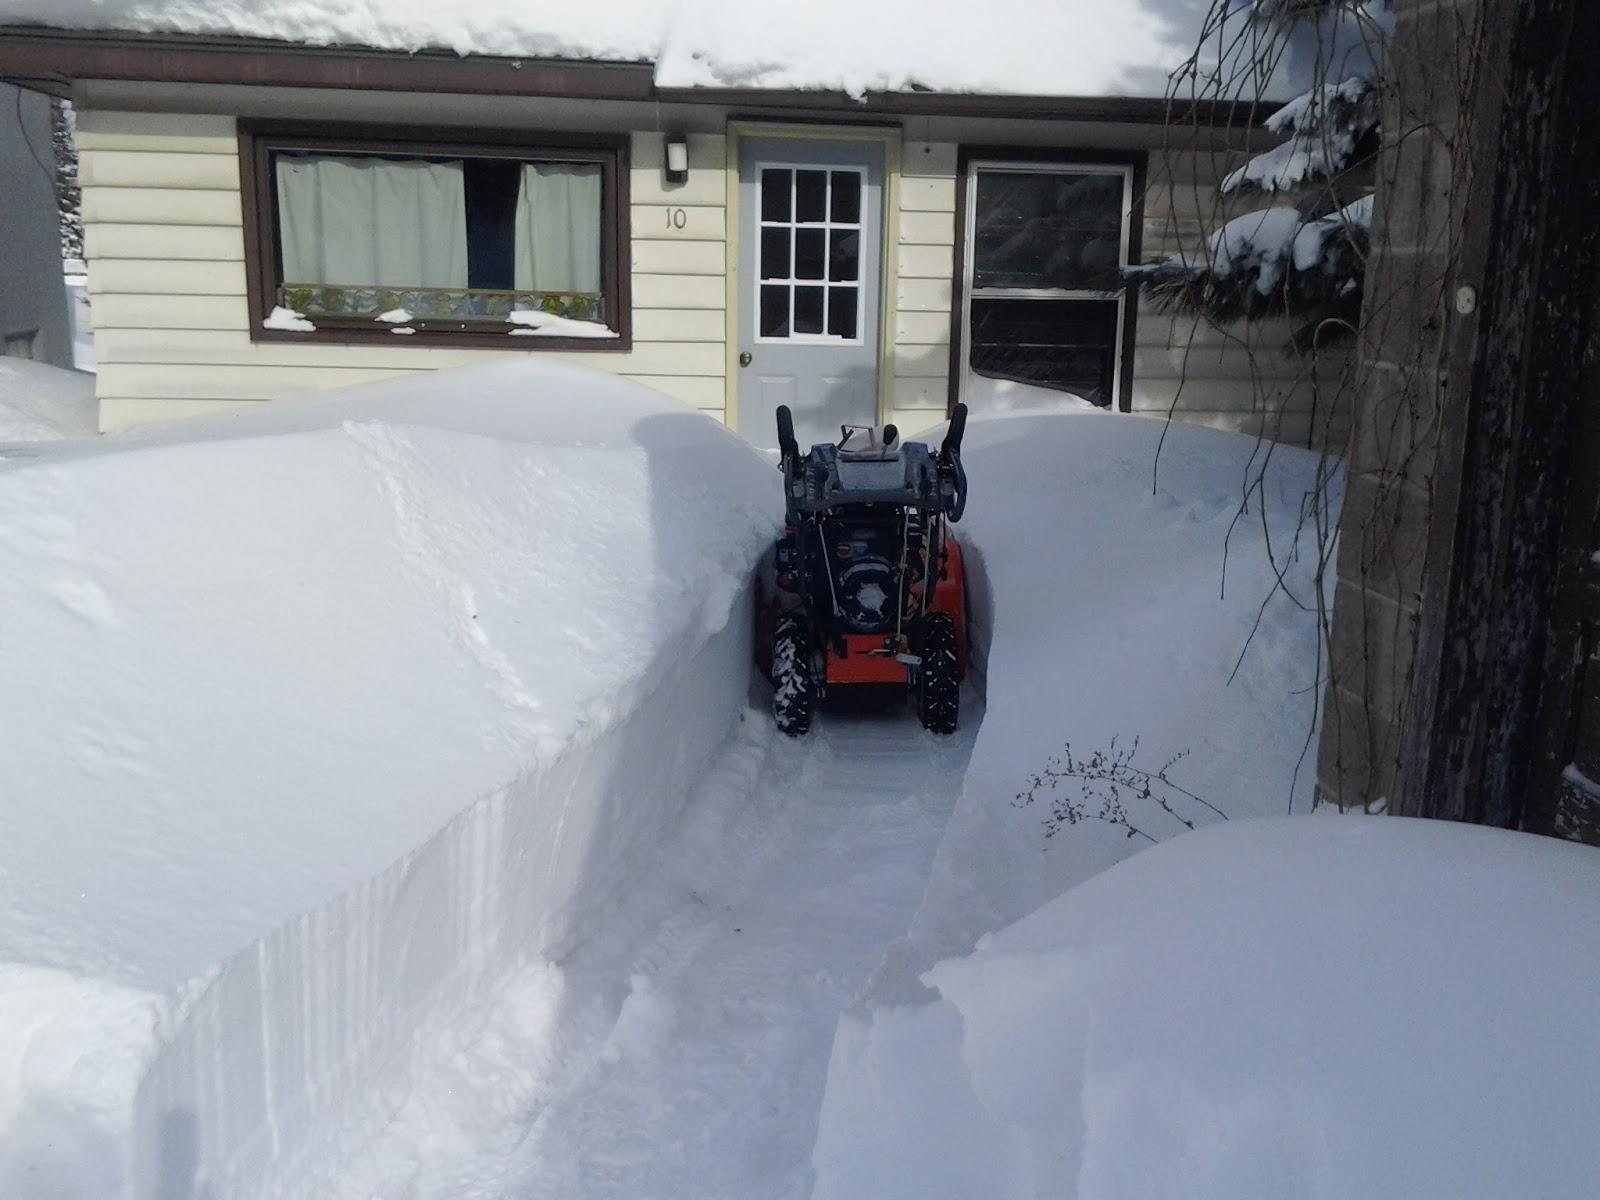 2/21/14 snowstorm, ely minnesota, john huisman